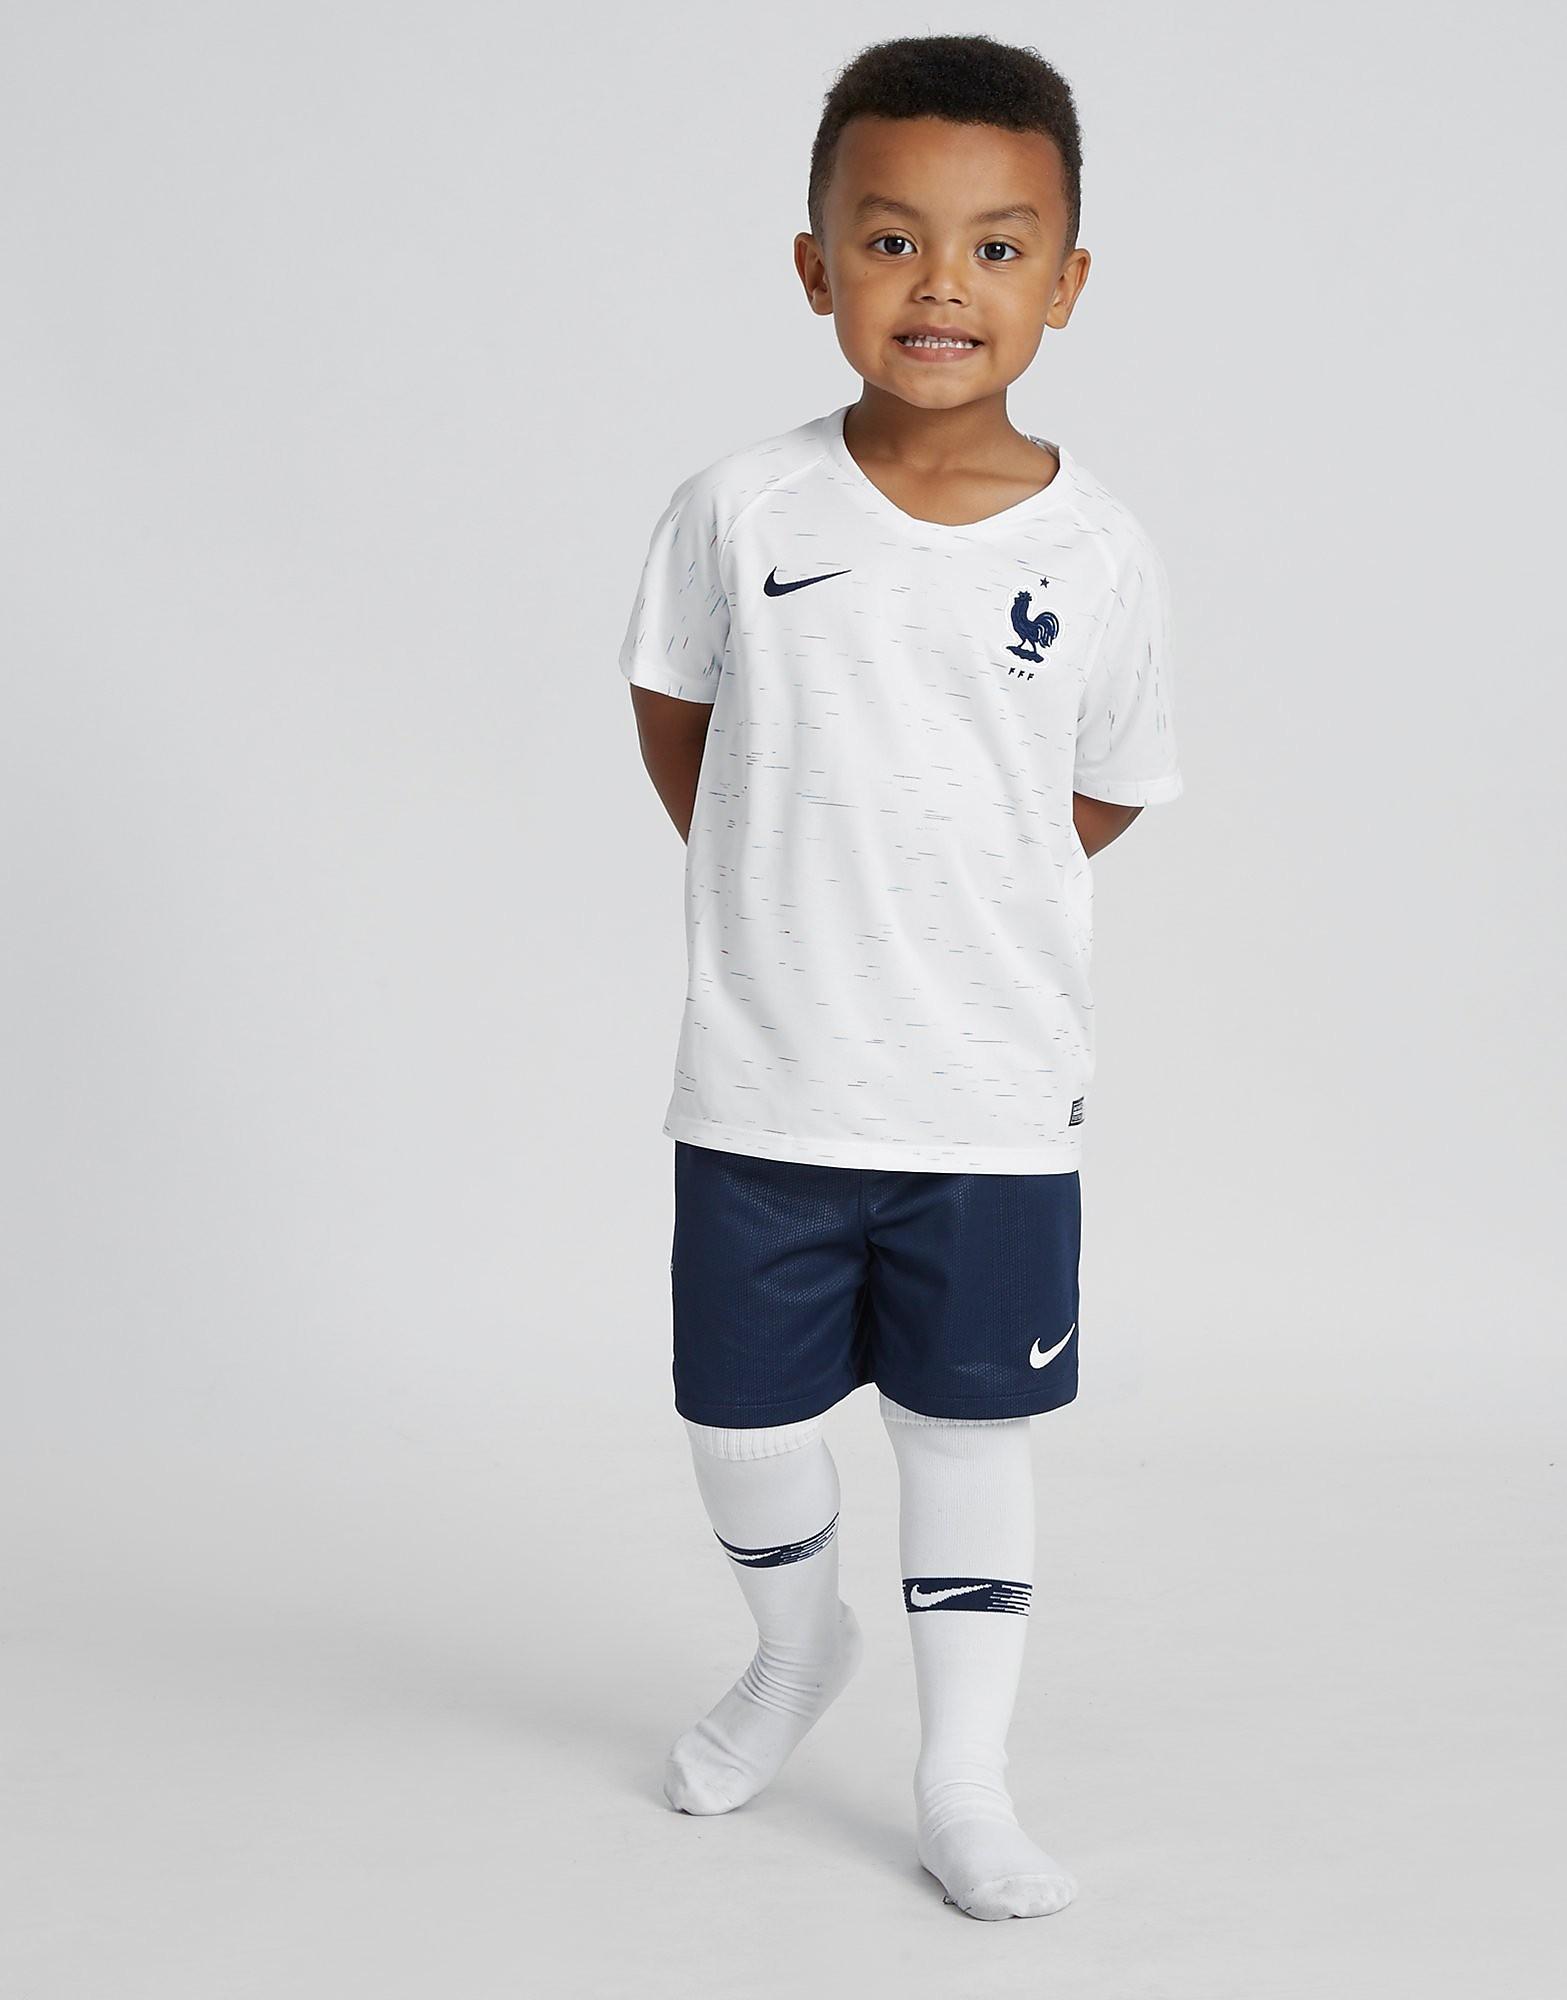 Nike conjunto Francia 2018 2.ª equipación infantil